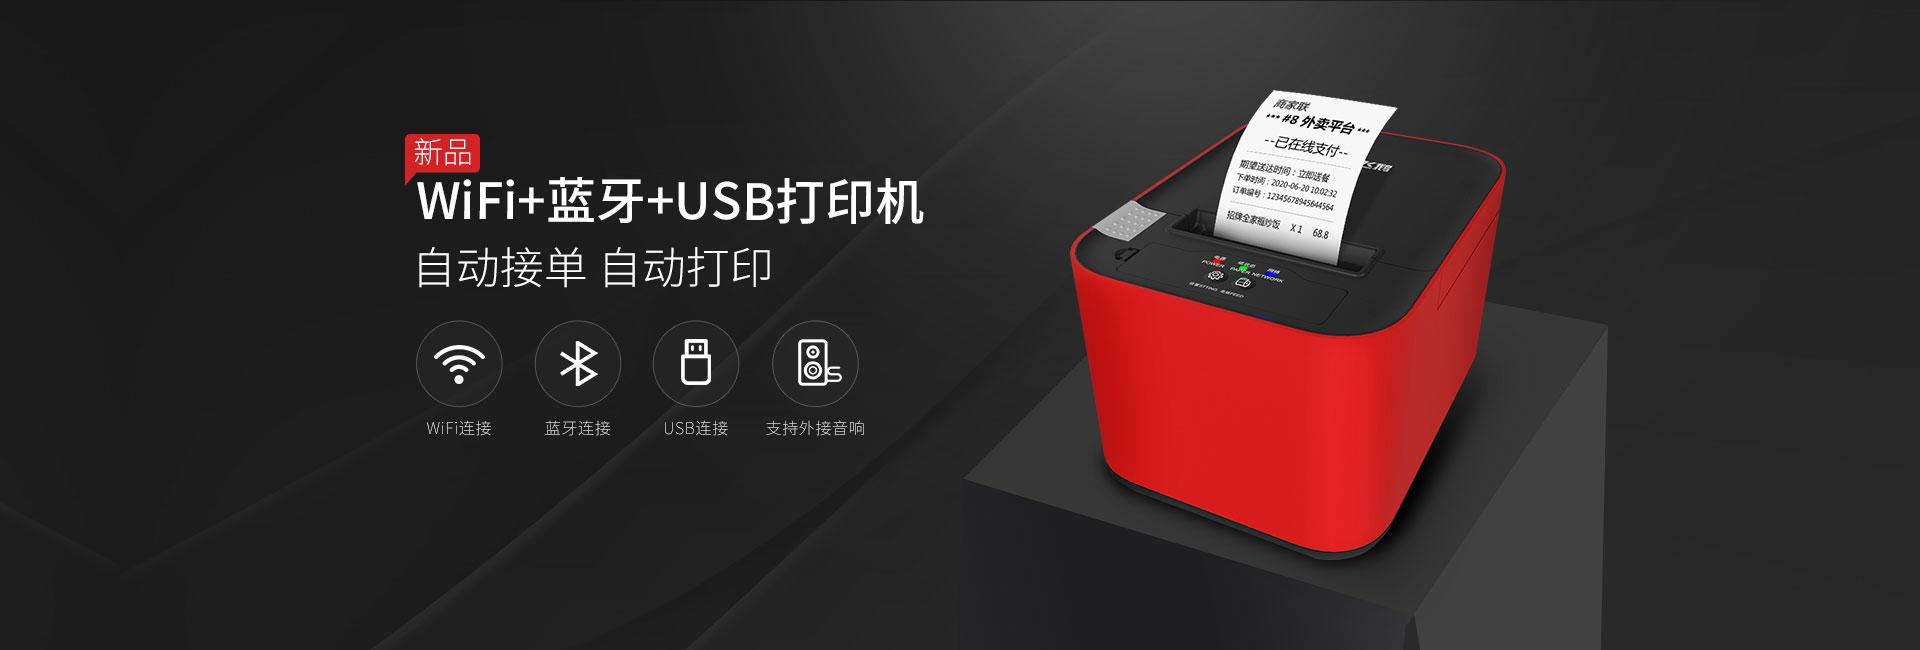 WiFi+蓝牙+USB打印机